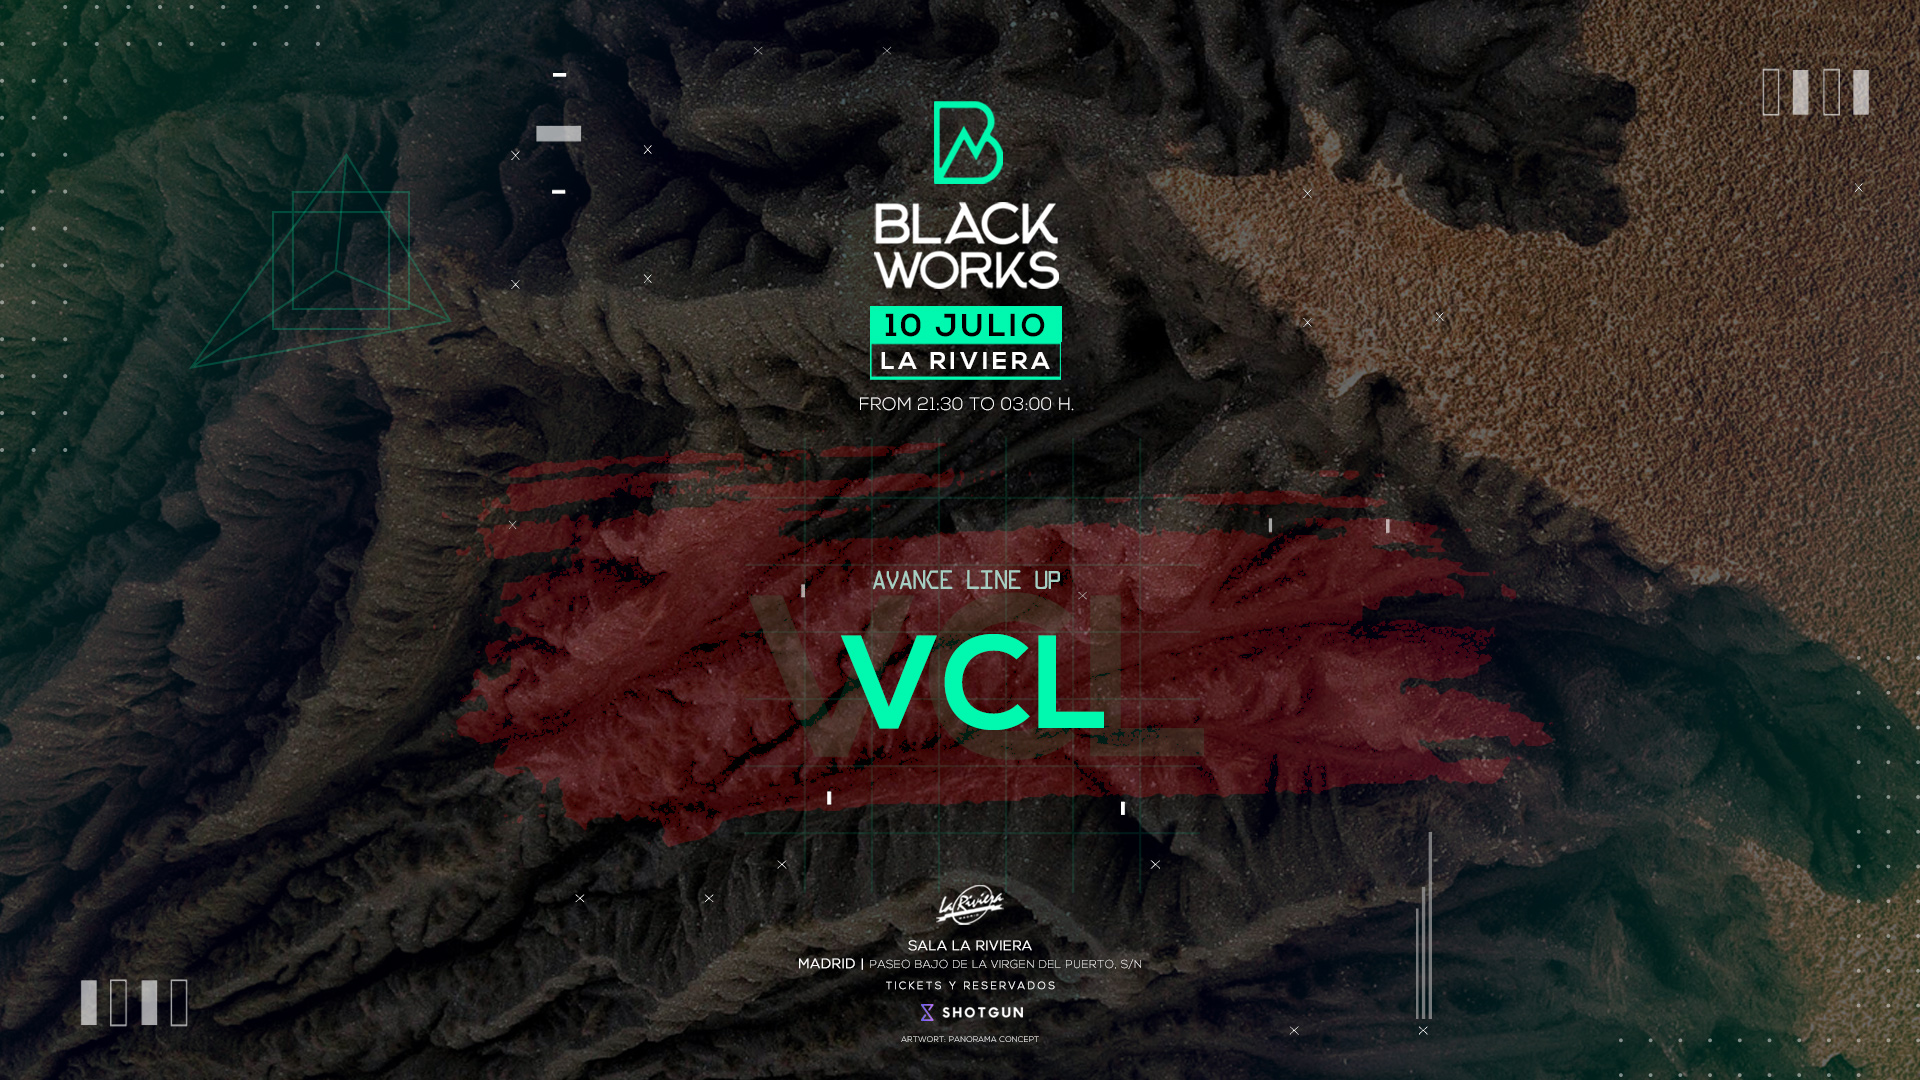 Blackworks Club: VCL